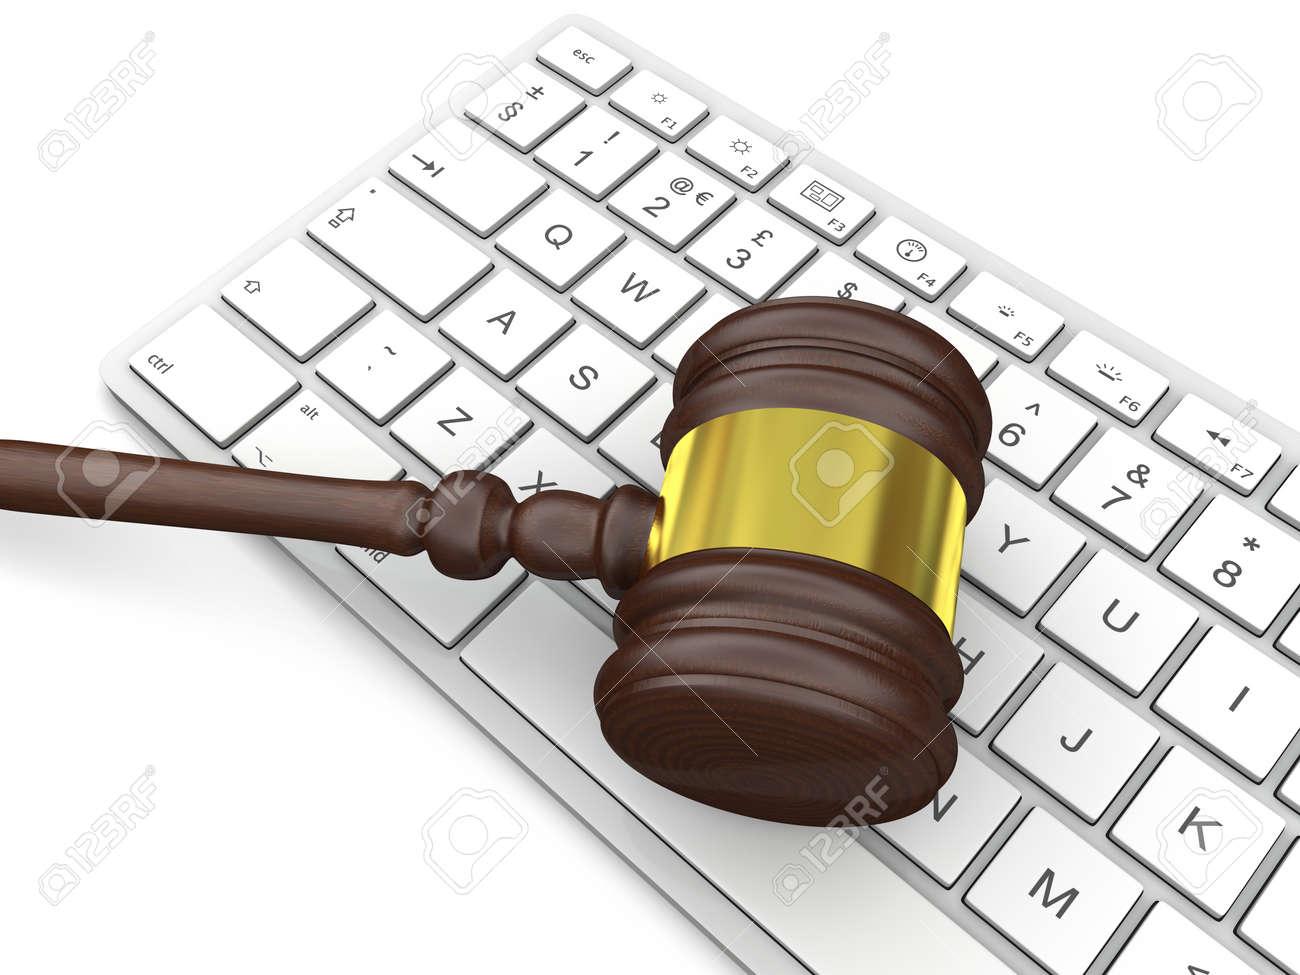 Wooden gavel on computer keyboard symbol of law and justice wooden gavel on computer keyboard symbol of law and justice in technology stock photo biocorpaavc